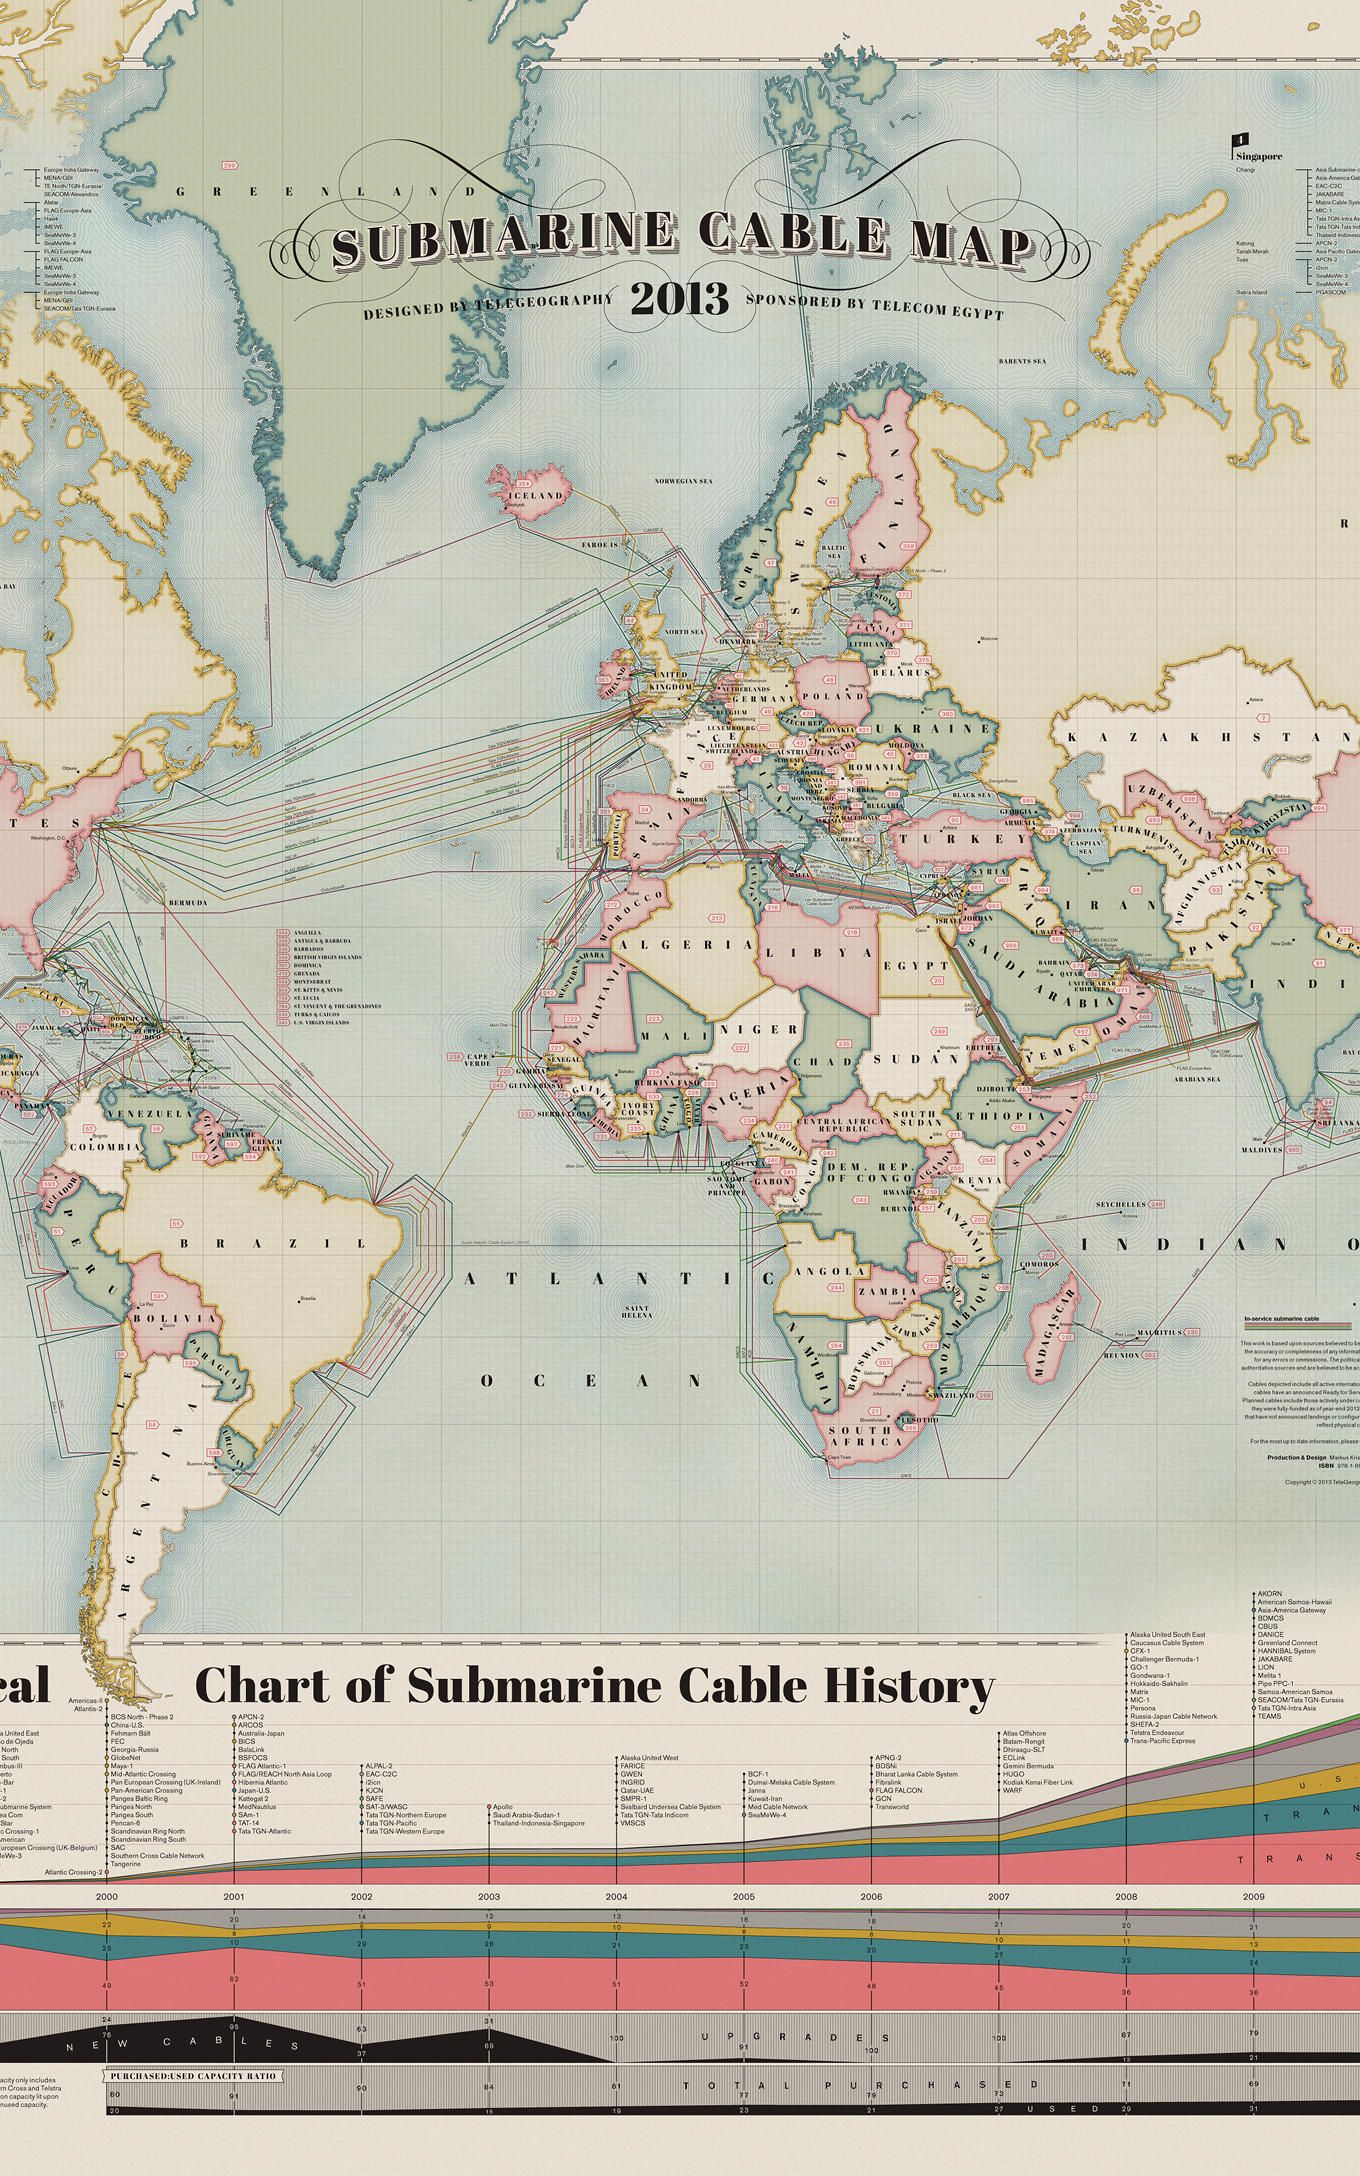 Submarine Cable Map 2013 | Internet | Pinterest | Business design ...